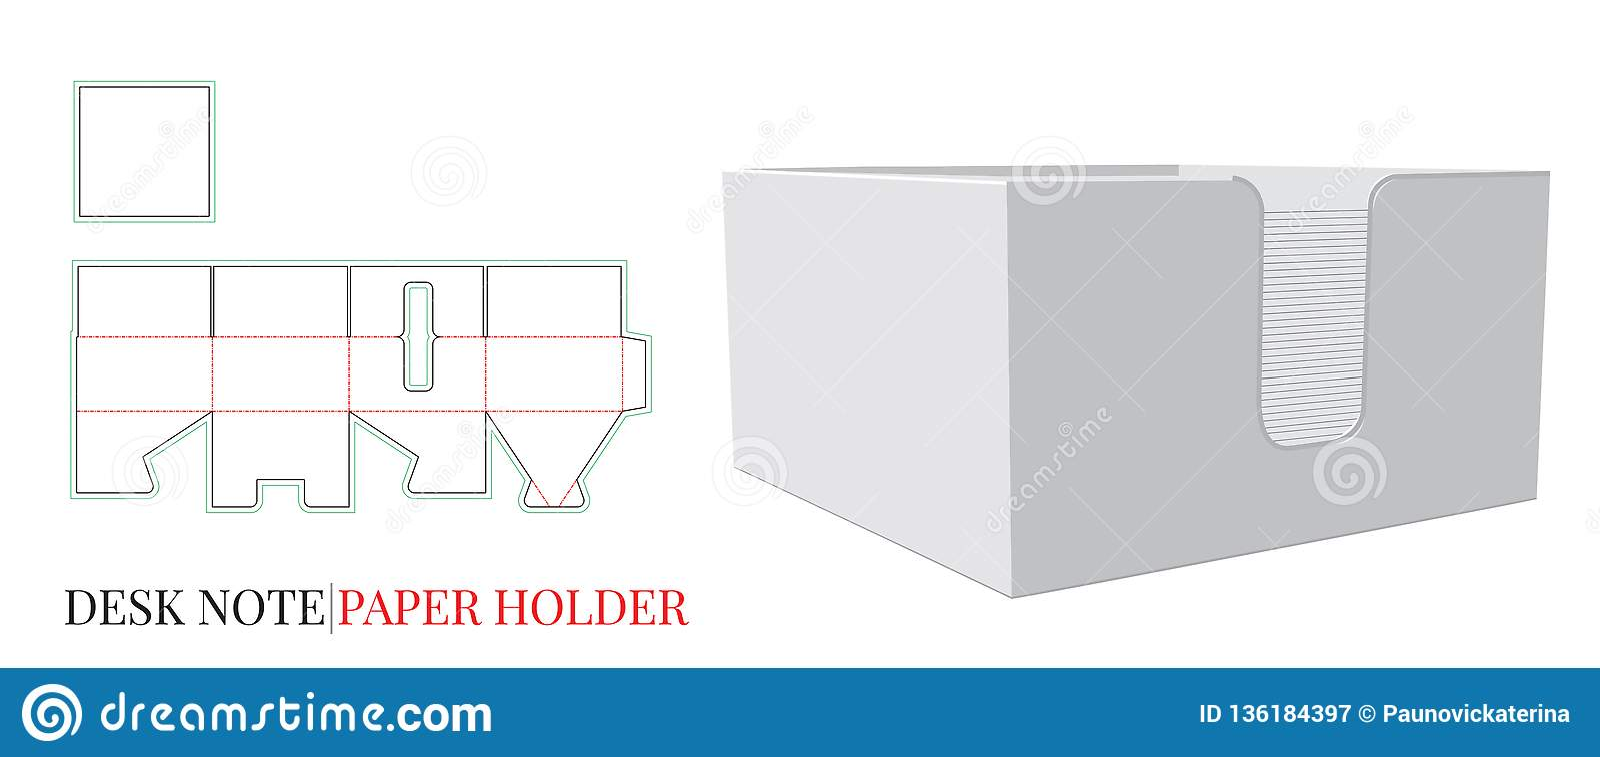 Enjoyable Paper Holder Template With Die Cut Laser Cut Lines Desk Download Free Architecture Designs Terchretrmadebymaigaardcom